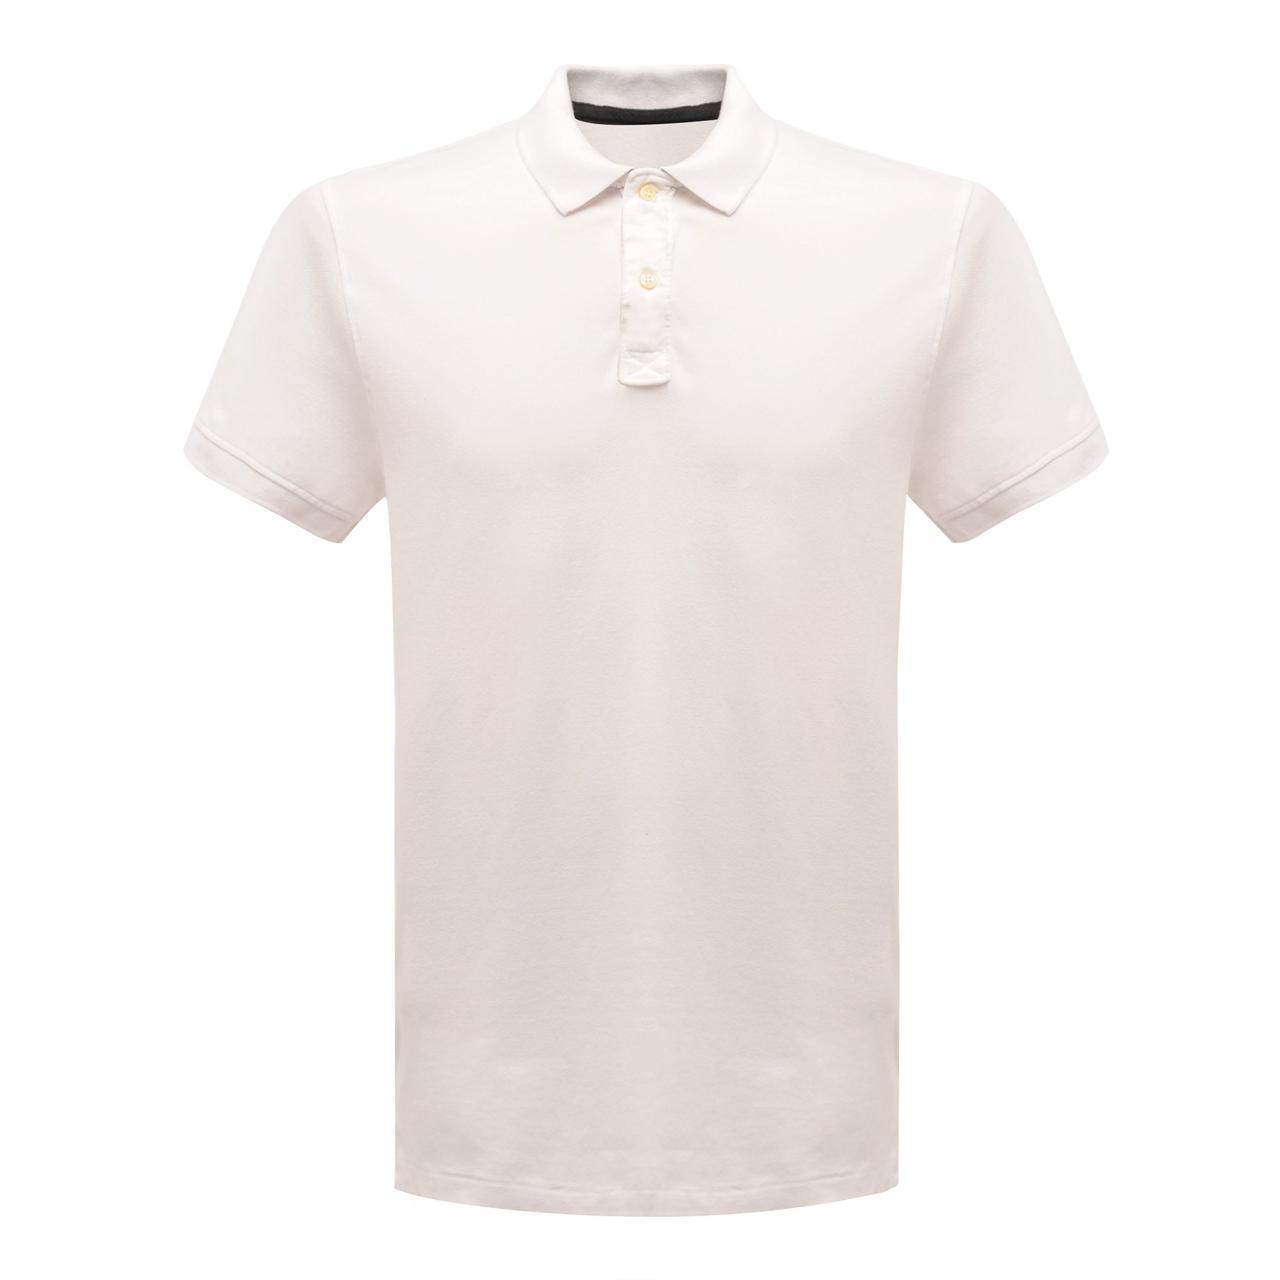 Поло Regatta Cls 65/35 Polo XXXL белый (TRS143_900_XXXL)